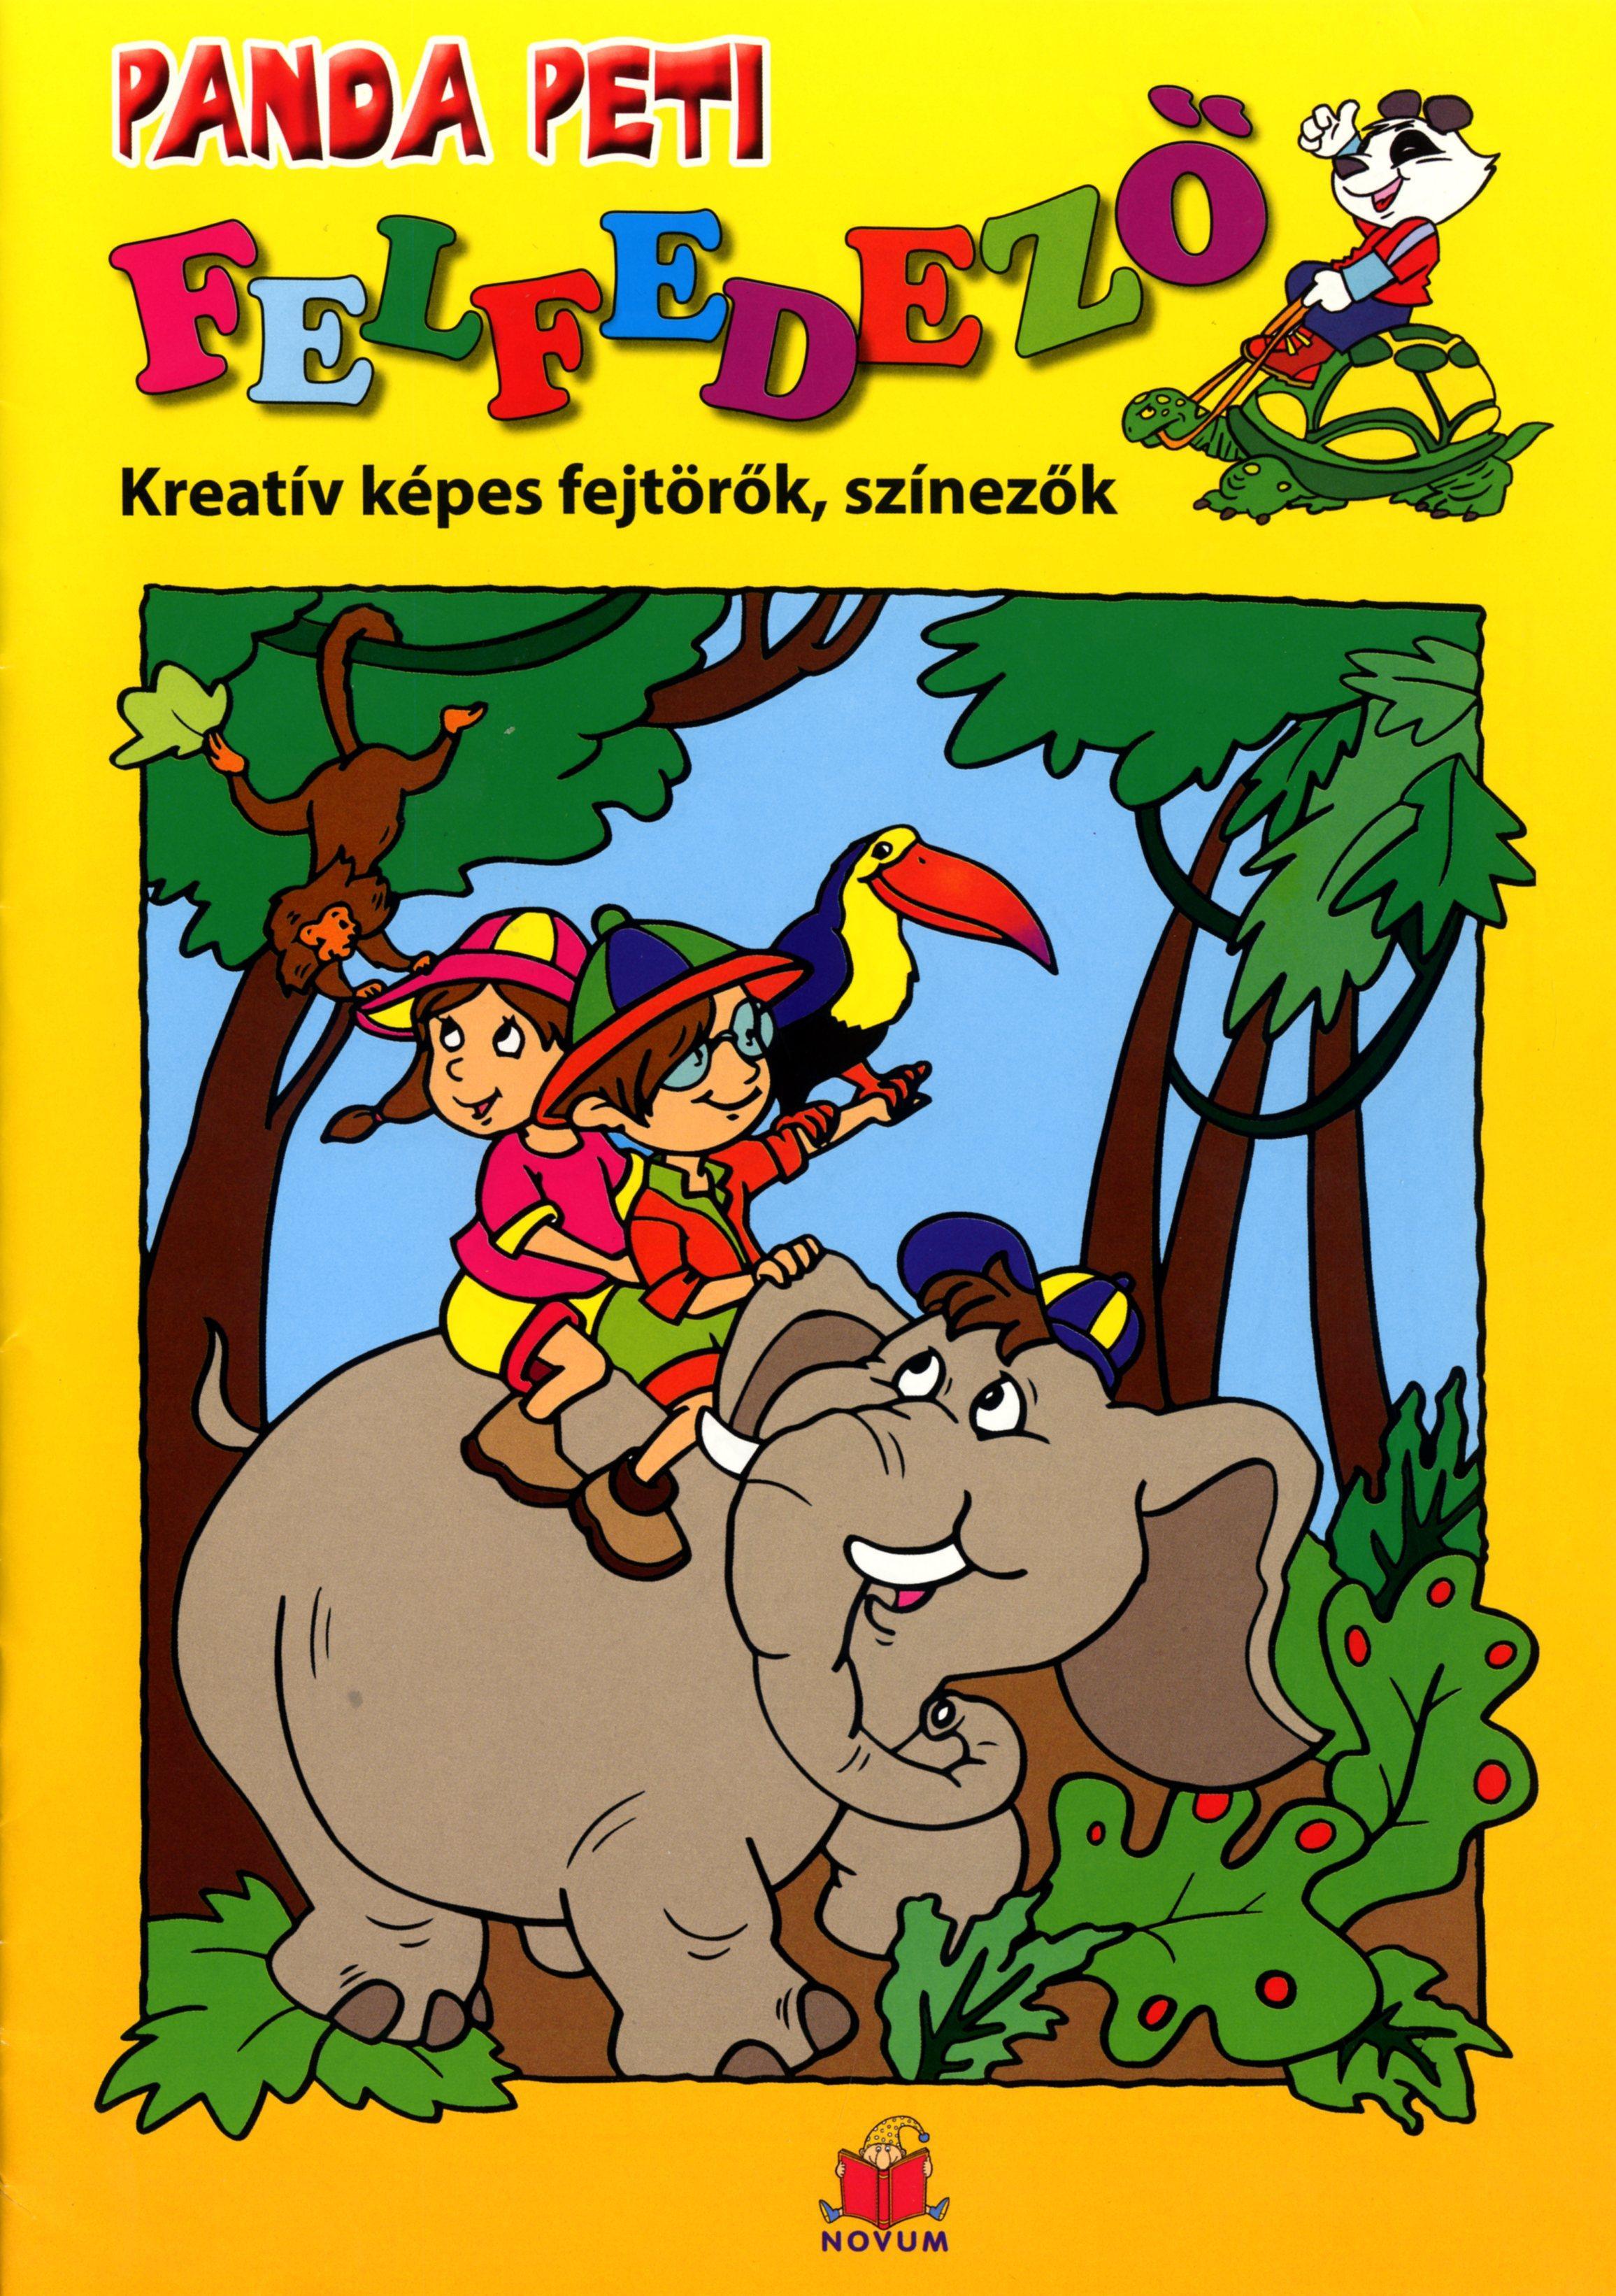 BOZSIK ROZÁLIA LUCA - PANDA PETI FELFEDEZŐ